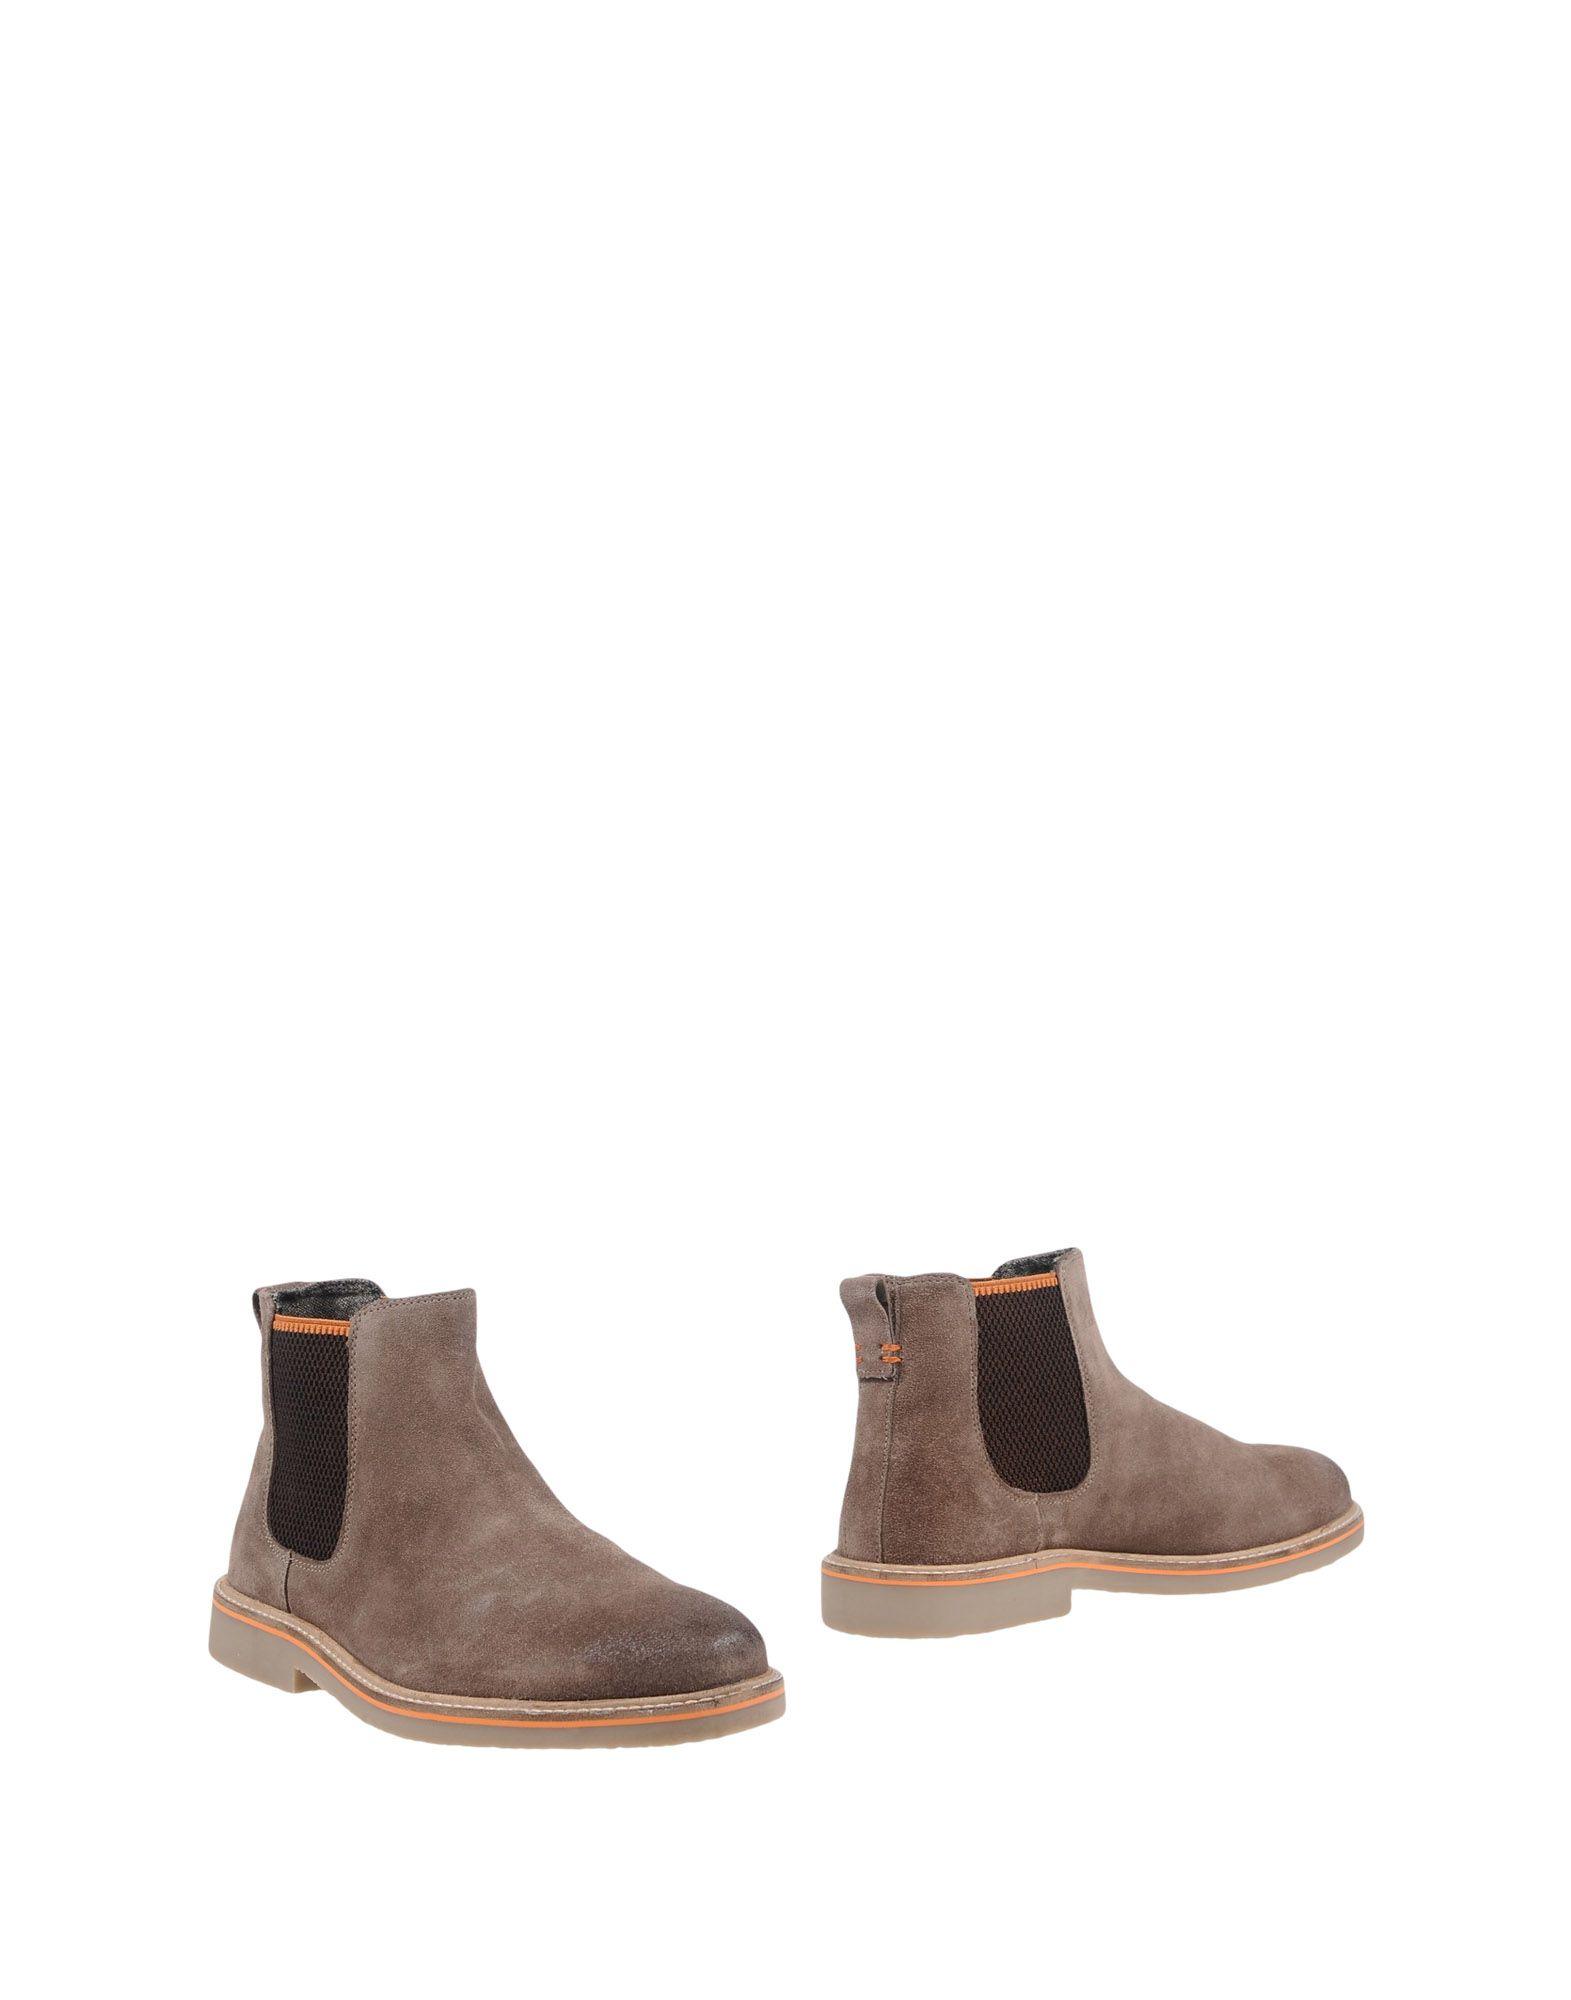 Rabatt echte Schuhe Gioseppo Herren Stiefelette Herren Gioseppo  11460812HP ae5e04